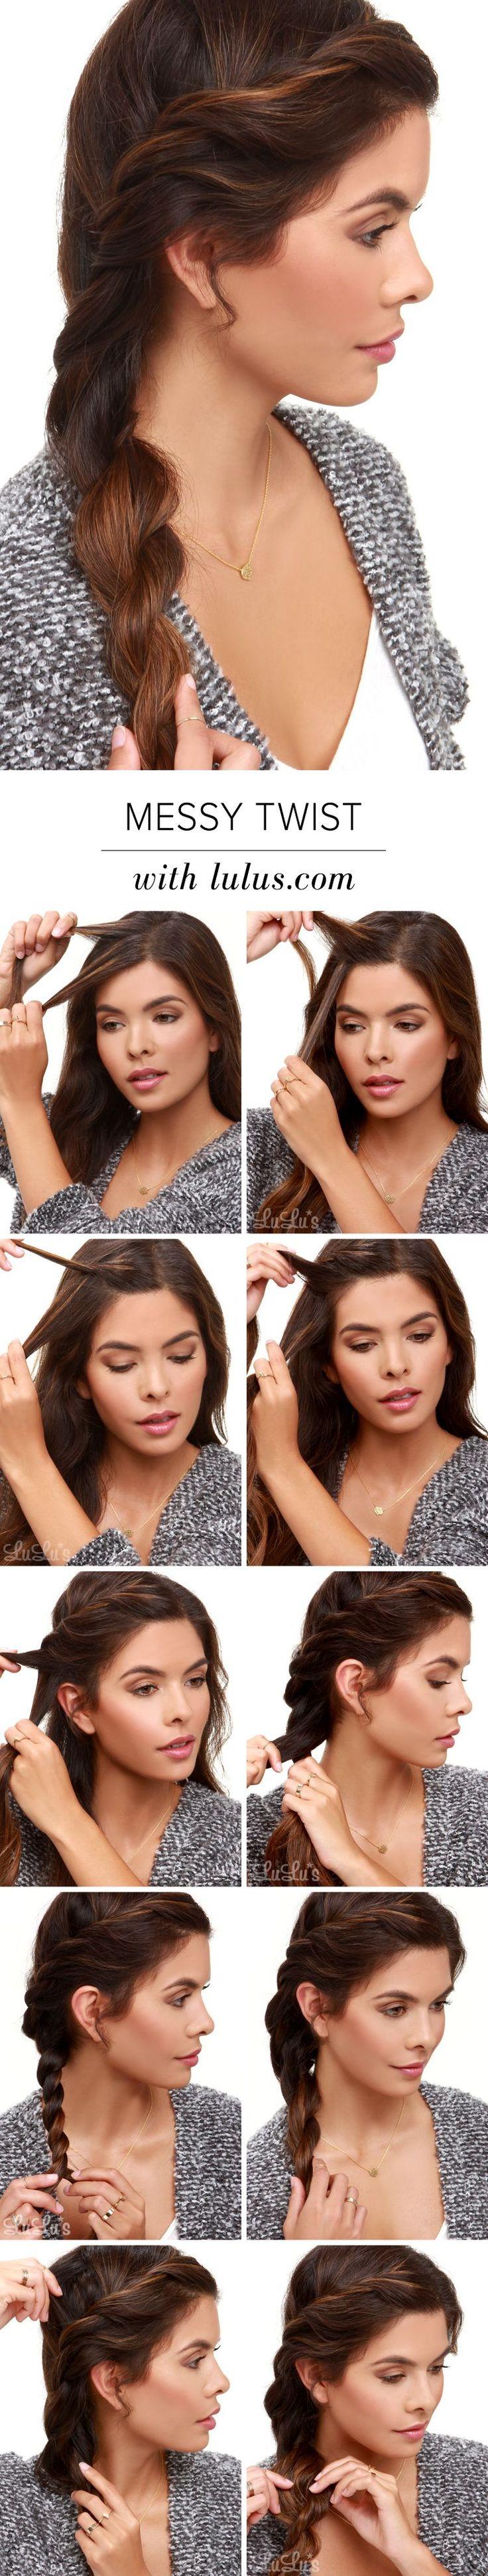 Lulus Howto: Messy Twist Hair Tutorial